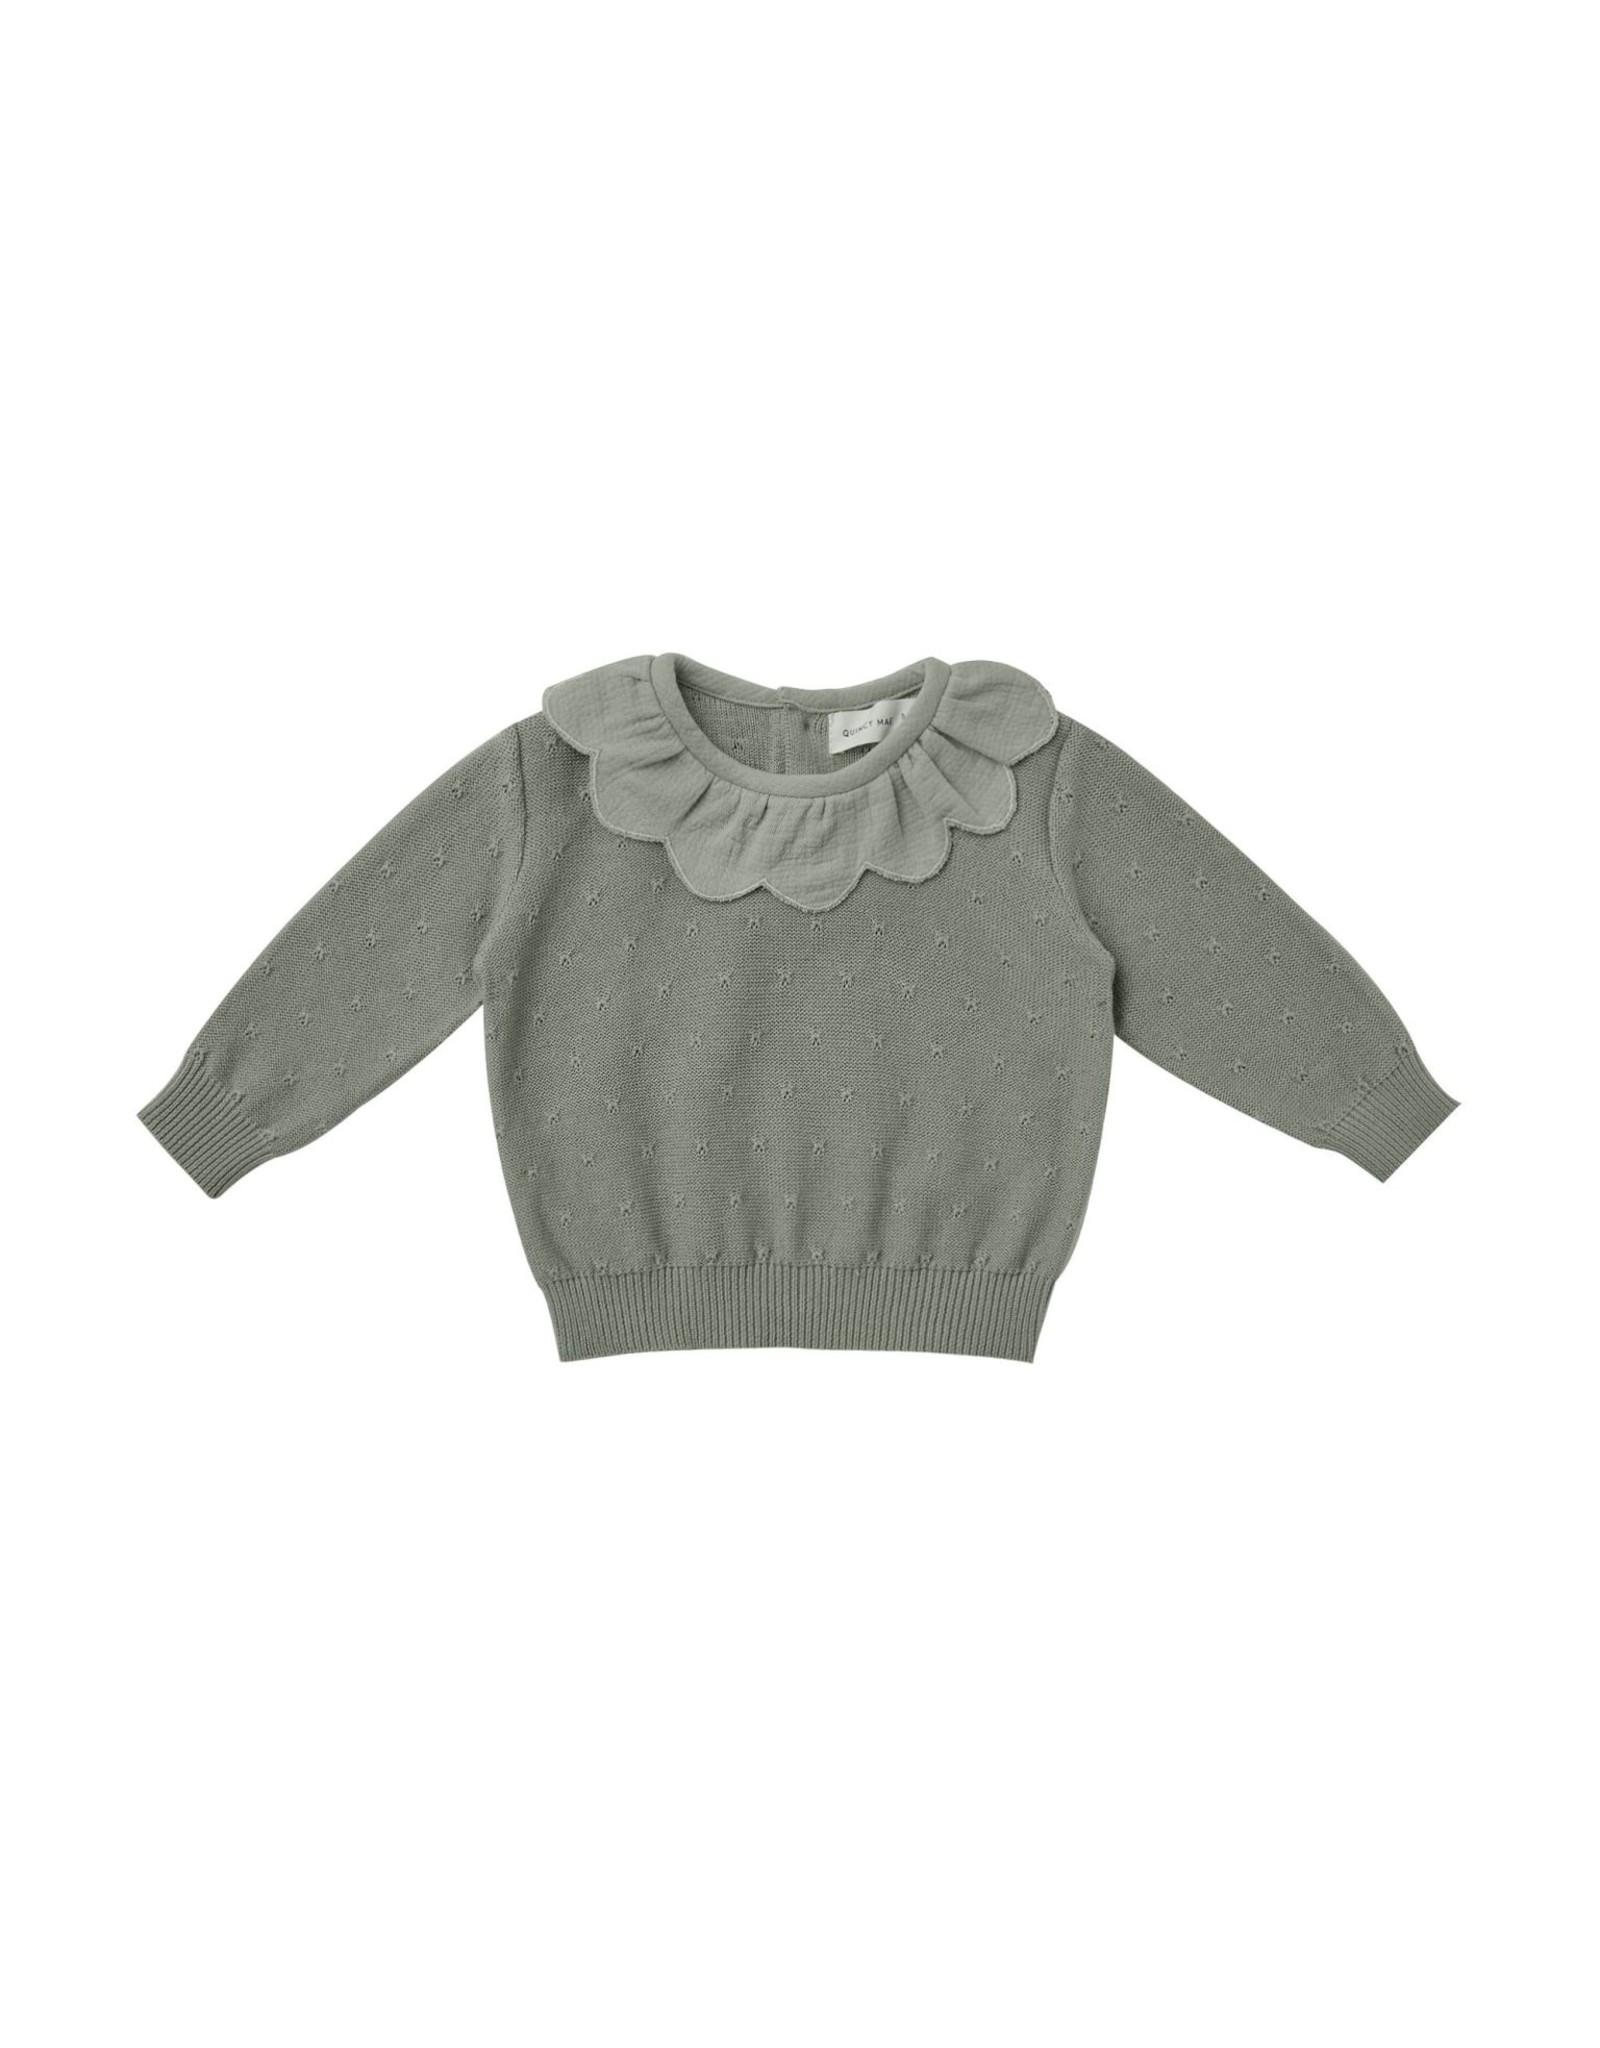 Quincy Mae petal sweater- basil